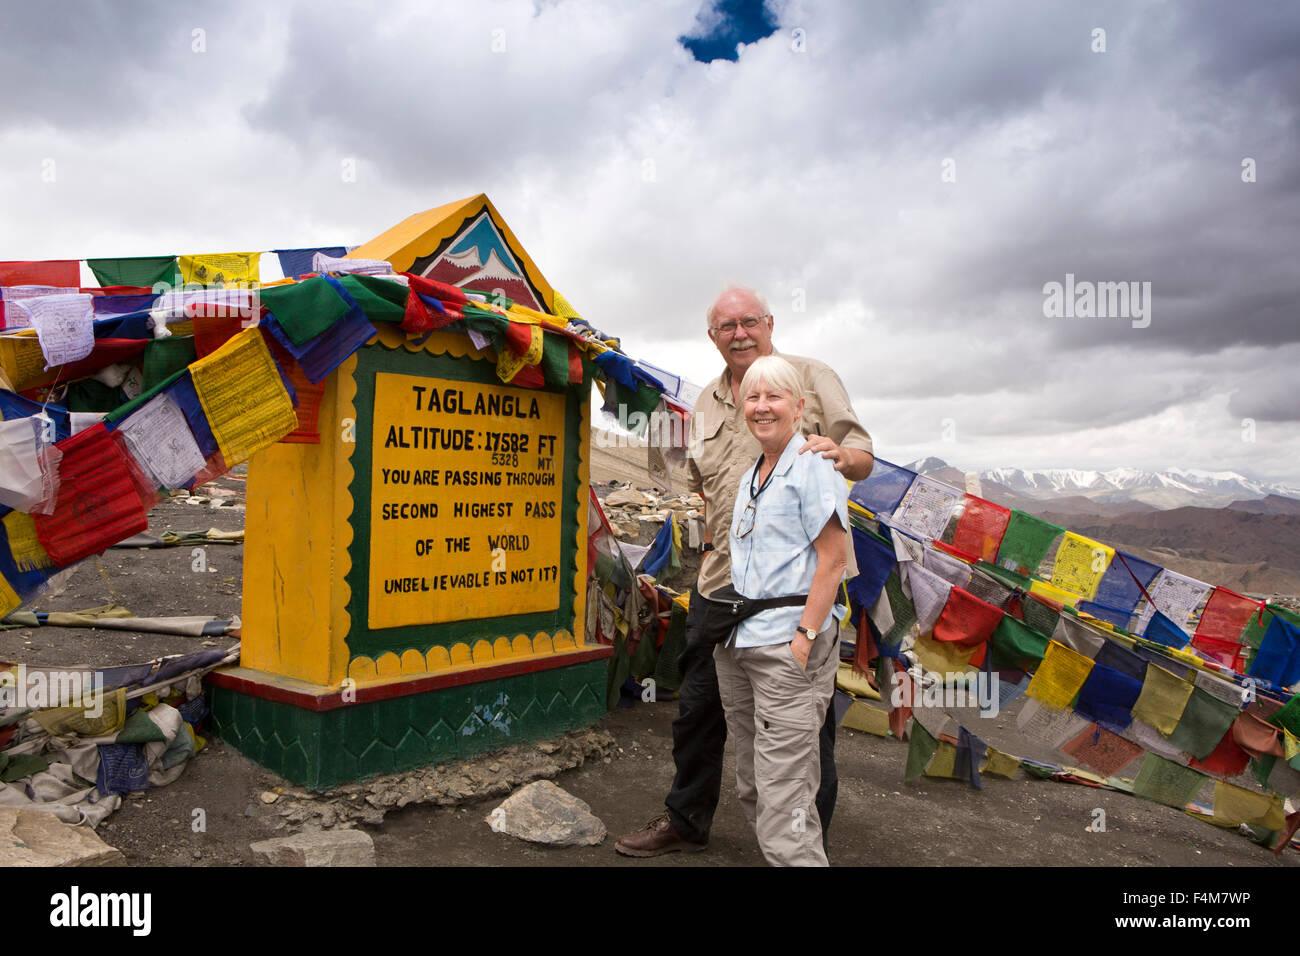 India, Jammu & Kashmir, Ladakh, Taglang La pass top, tourist couple at summit sign - Stock Image